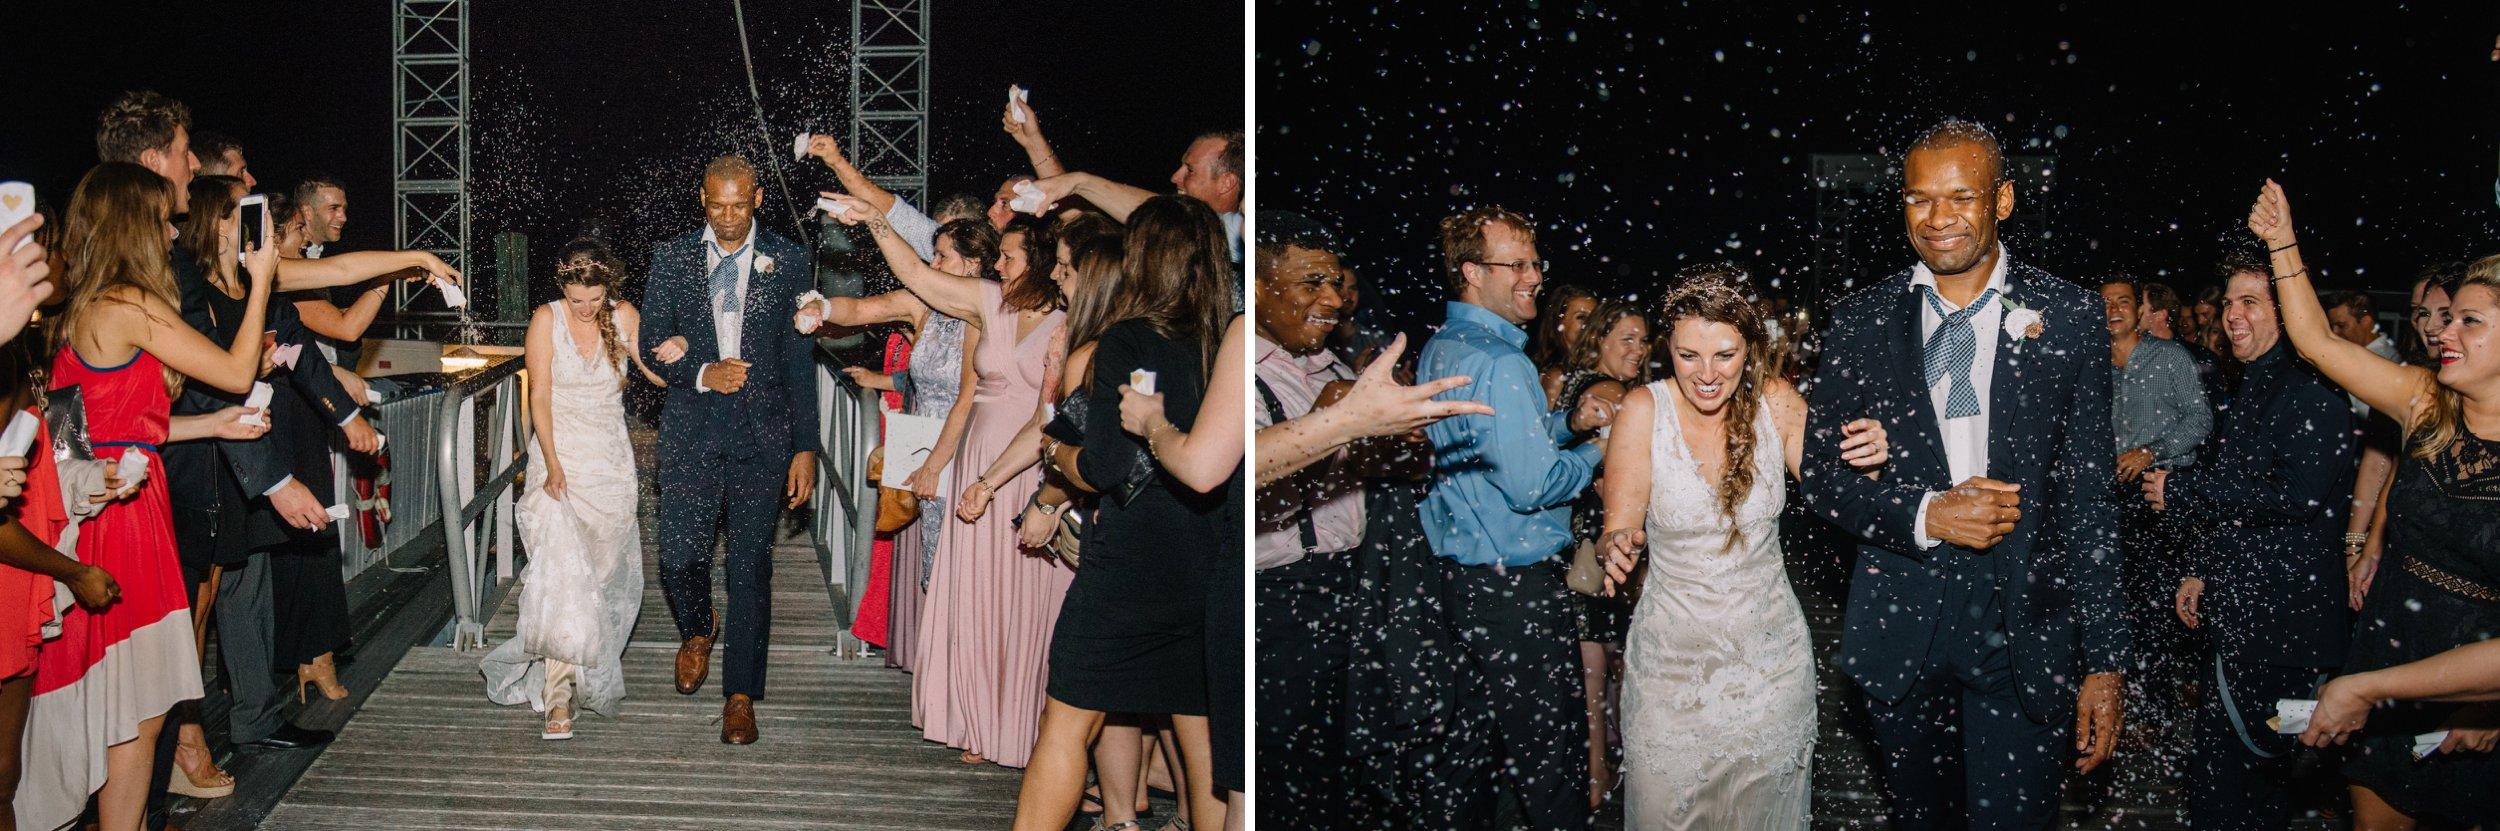 Charleston-wedding-photographer_0041.jpg